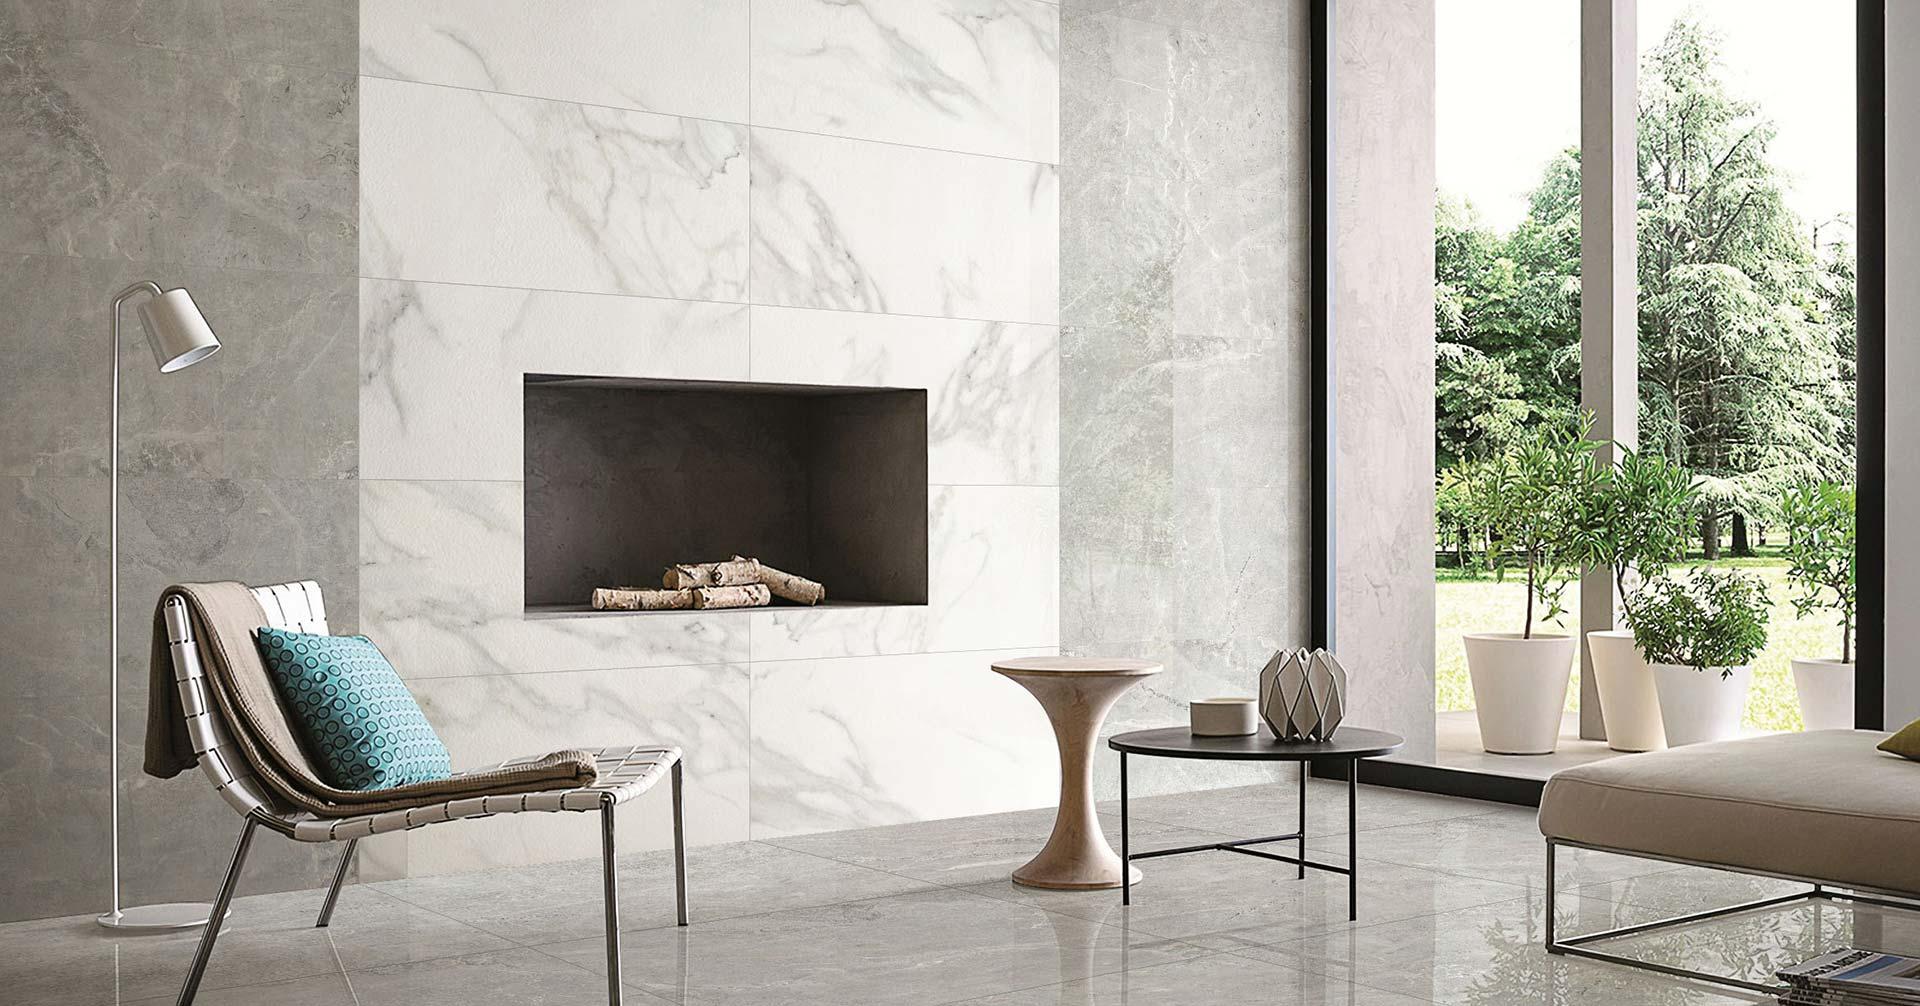 StepGuard the subverter of marble tile